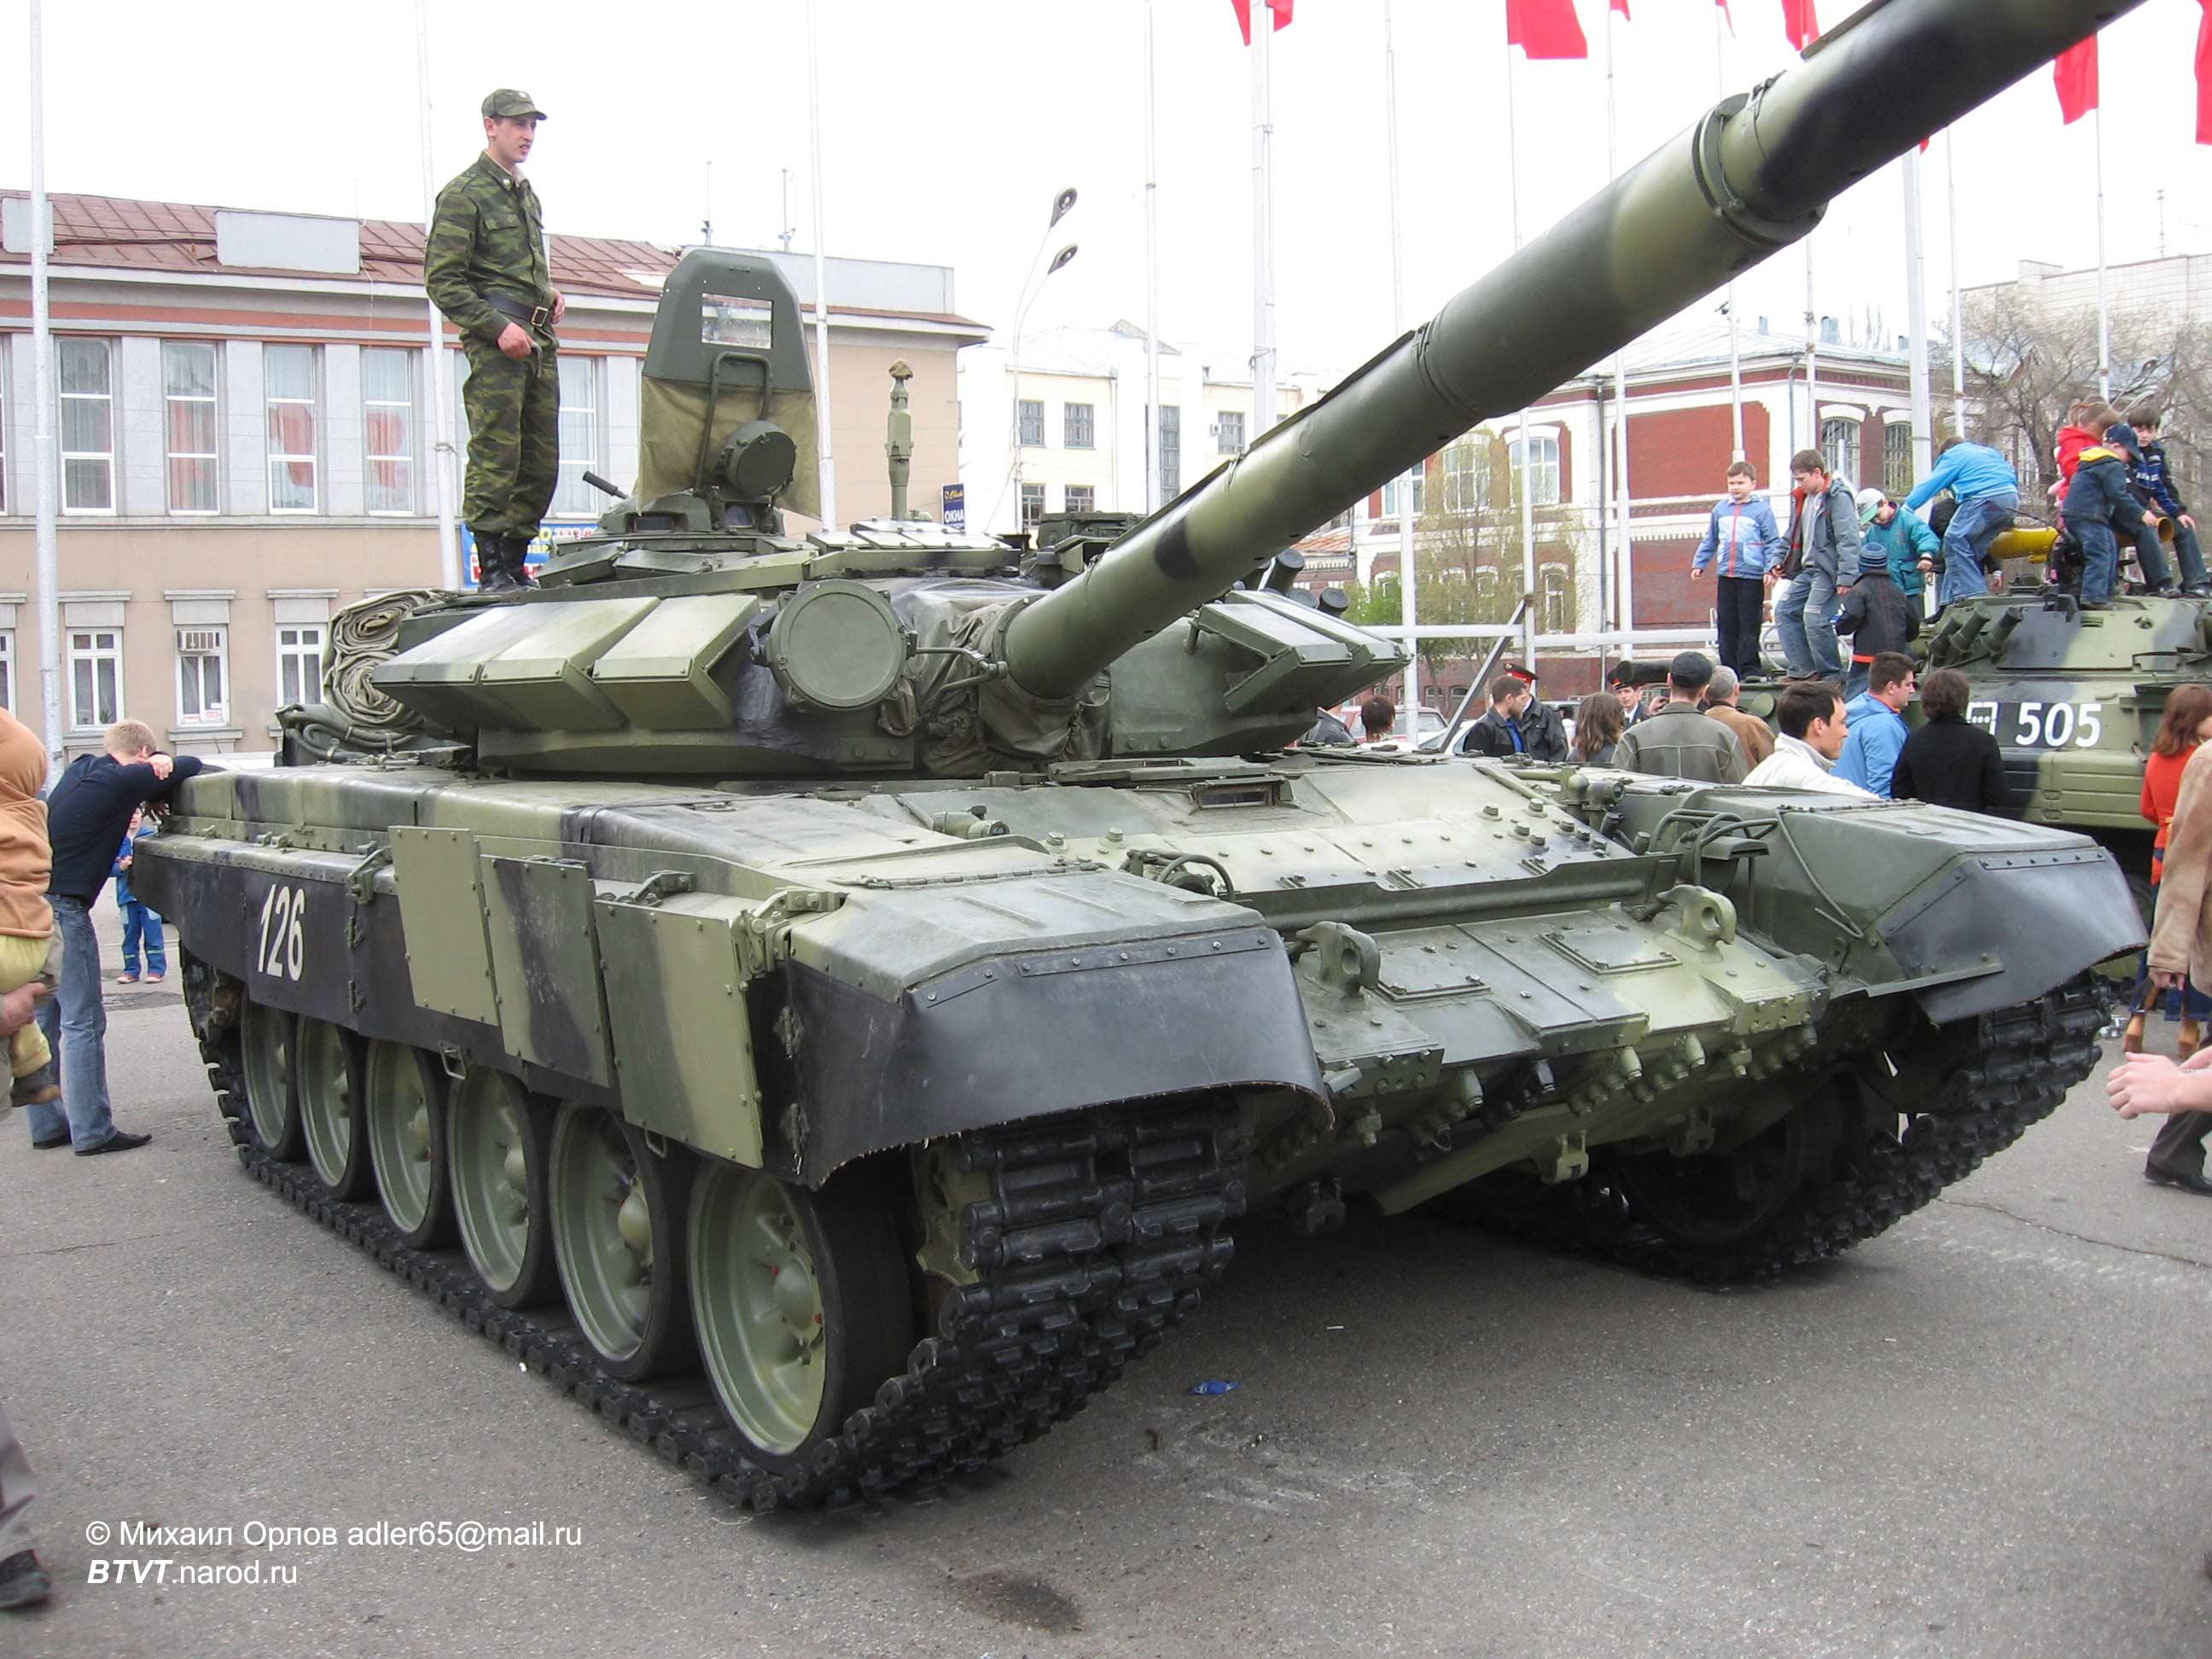 http://btvt.narod.ru/5/t72b_mai/IMG_2606.jpg